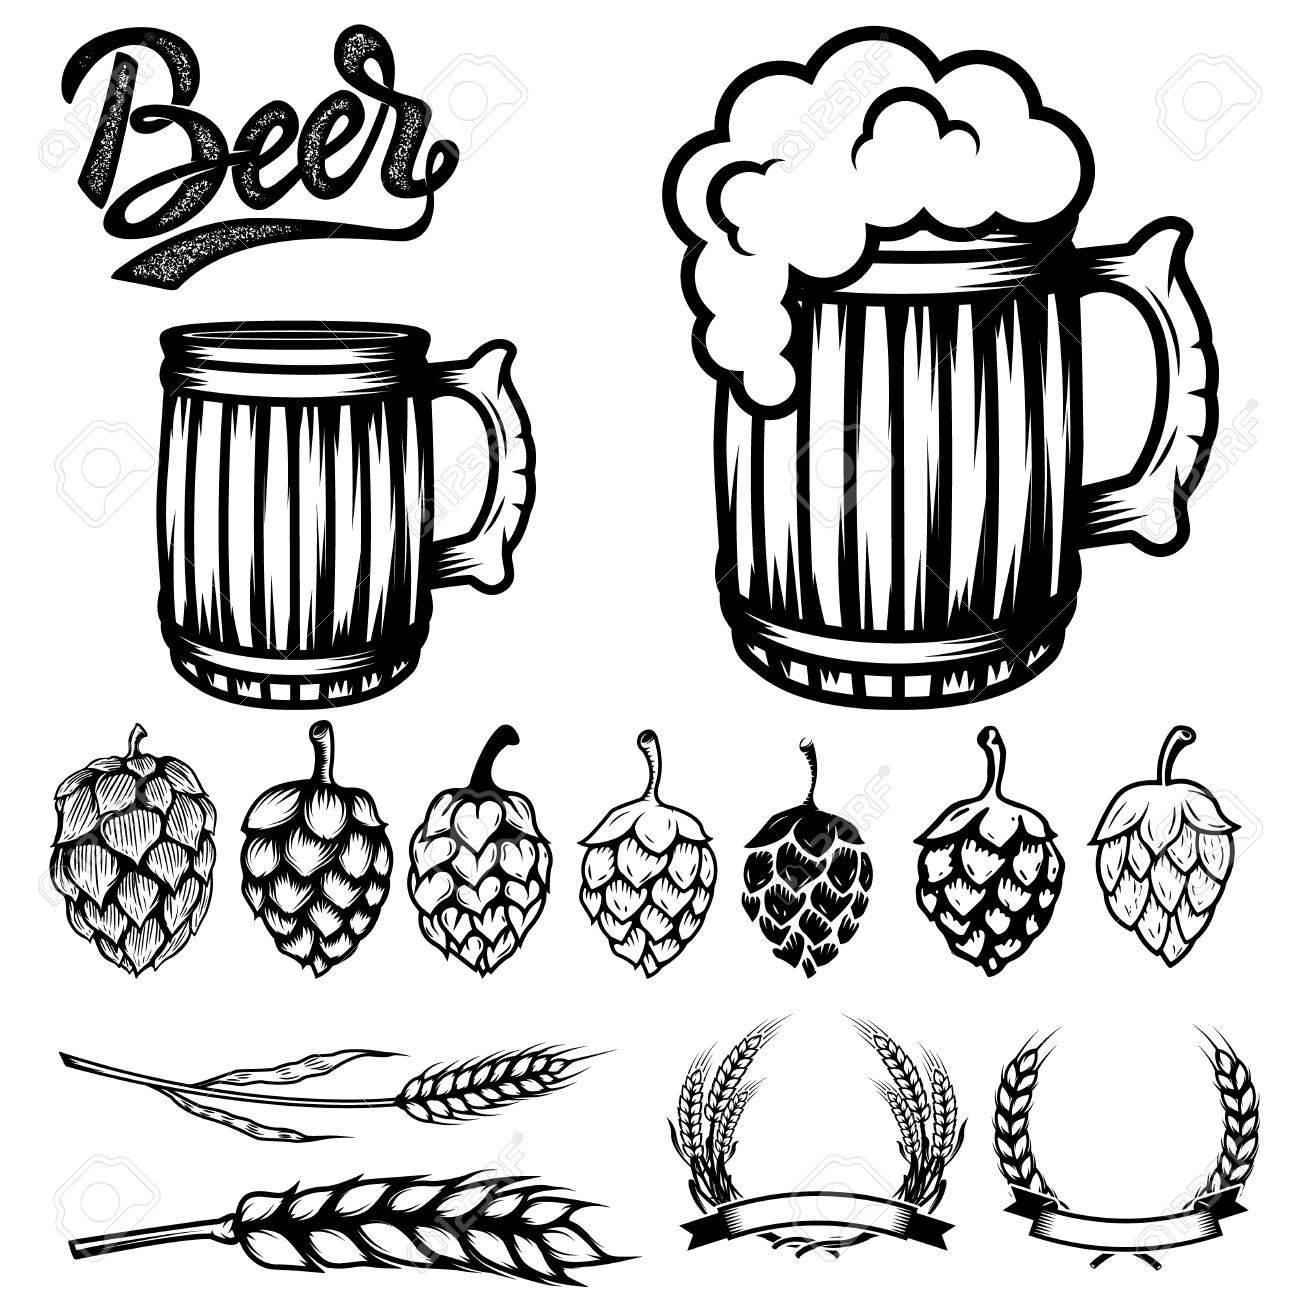 1299x1300 Set Of Components For Beer Labels Design. Beer Mugs, Hops, Wheat